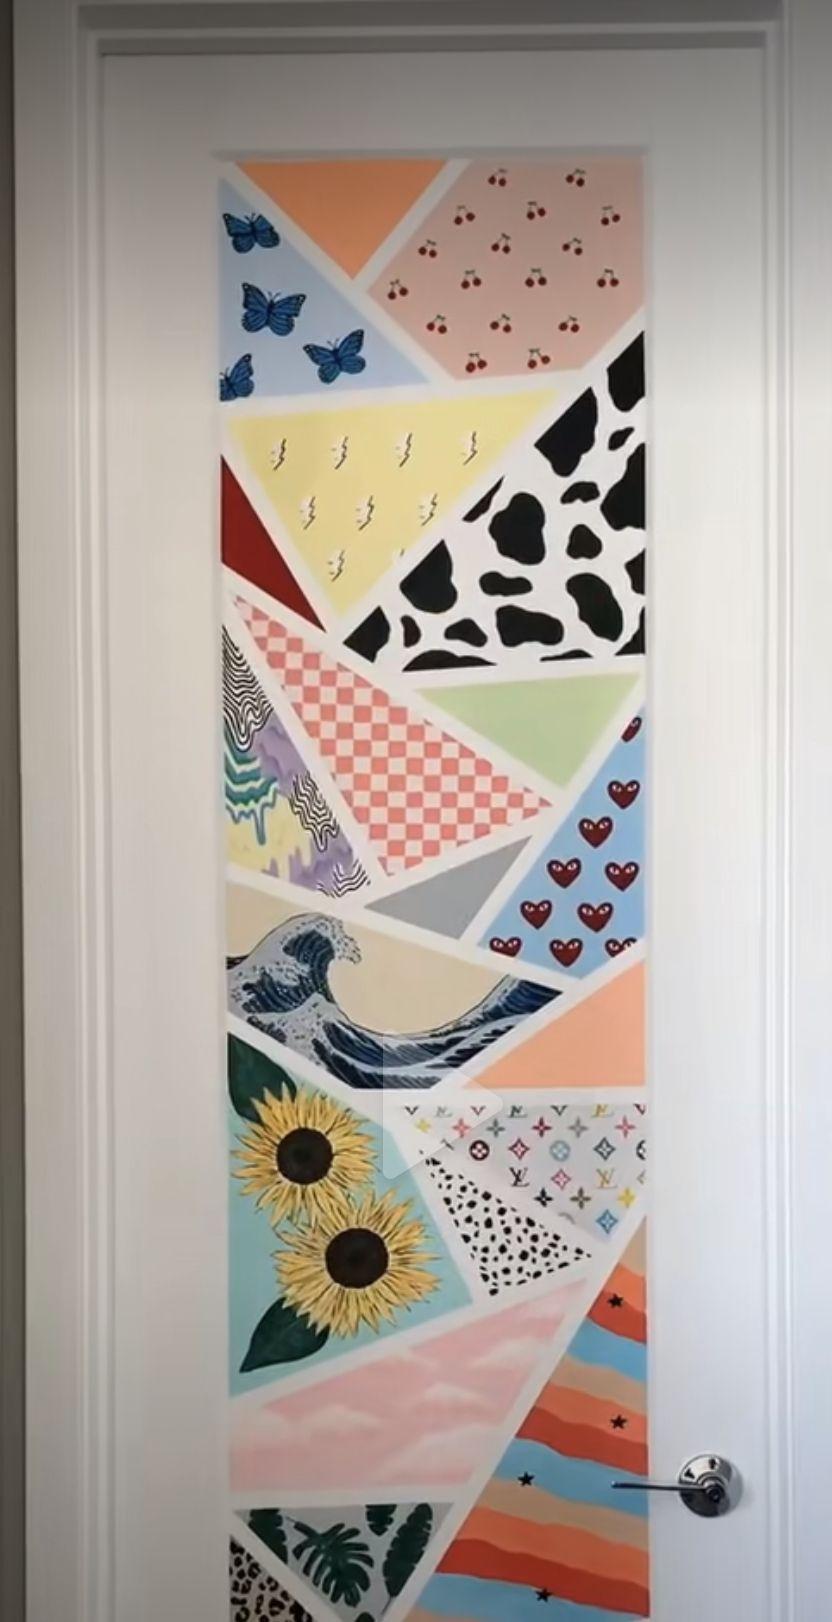 Painted Door From Tiktok 3 In 2020 Painted Bedroom Doors Diy Art Painting Diy Canvas Art